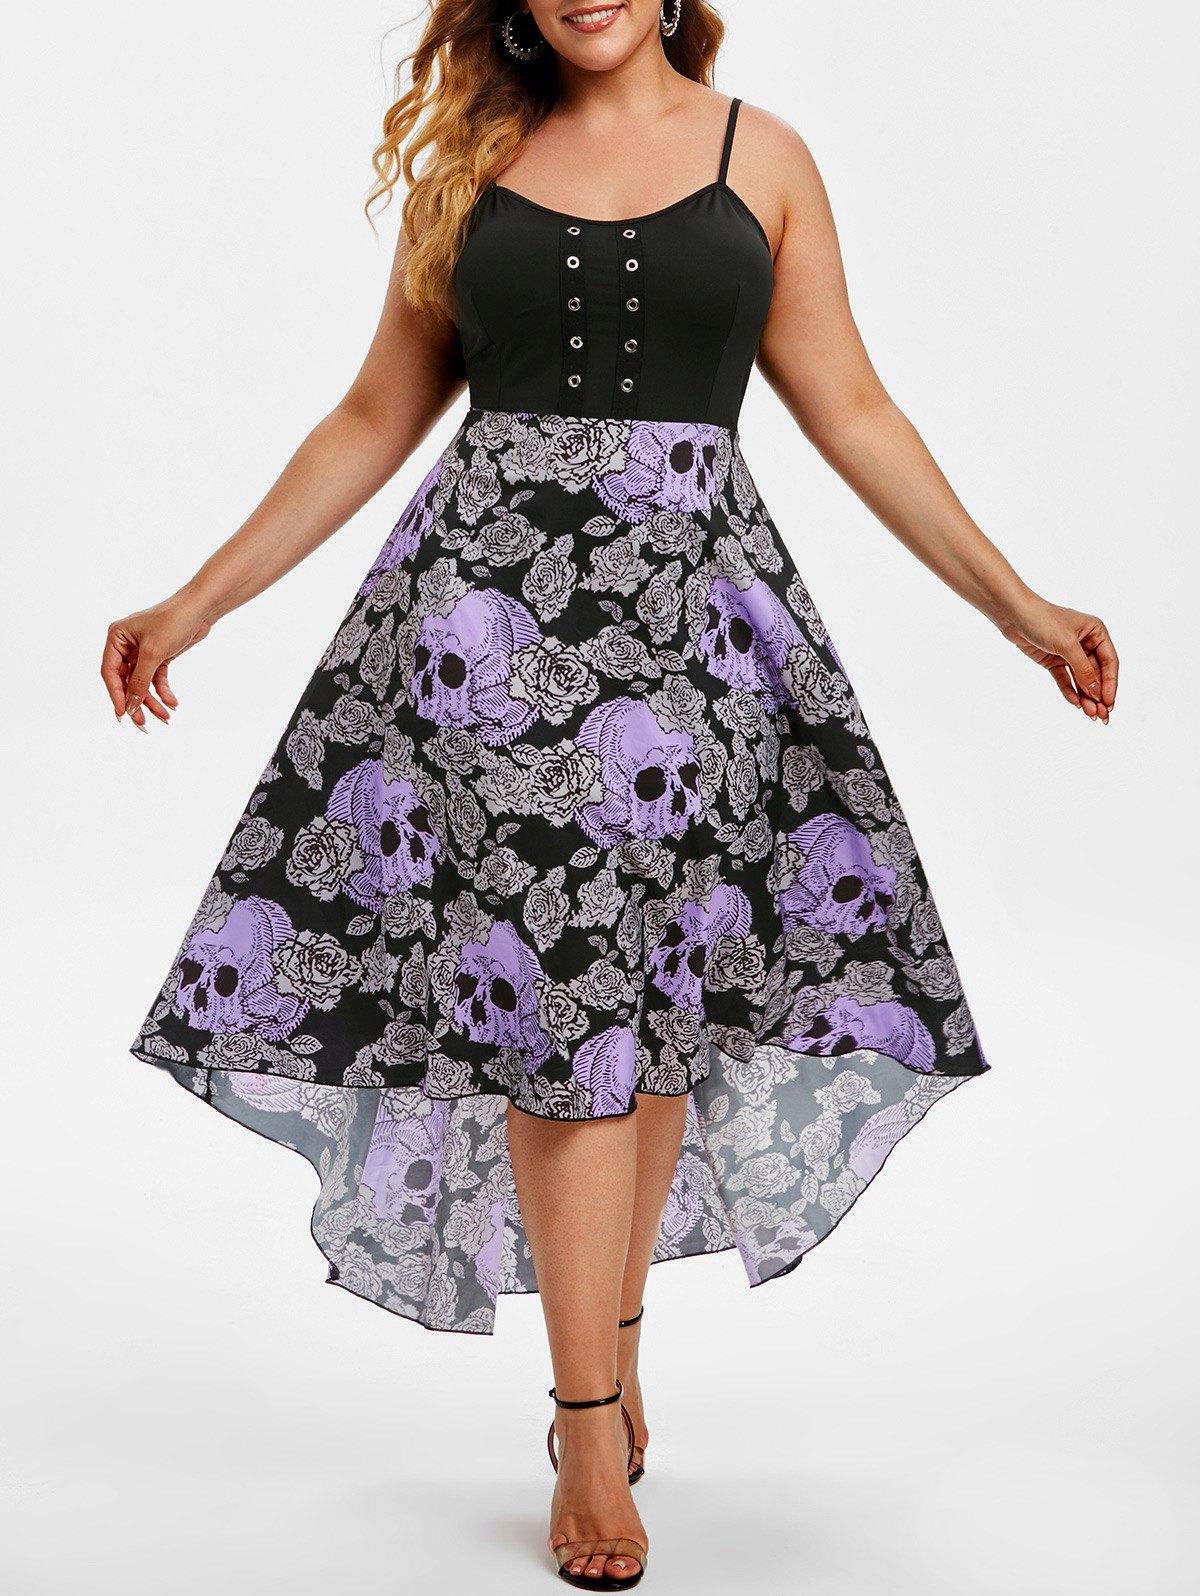 Grommet High Low Floral Skull Halloween Plus Size Dress